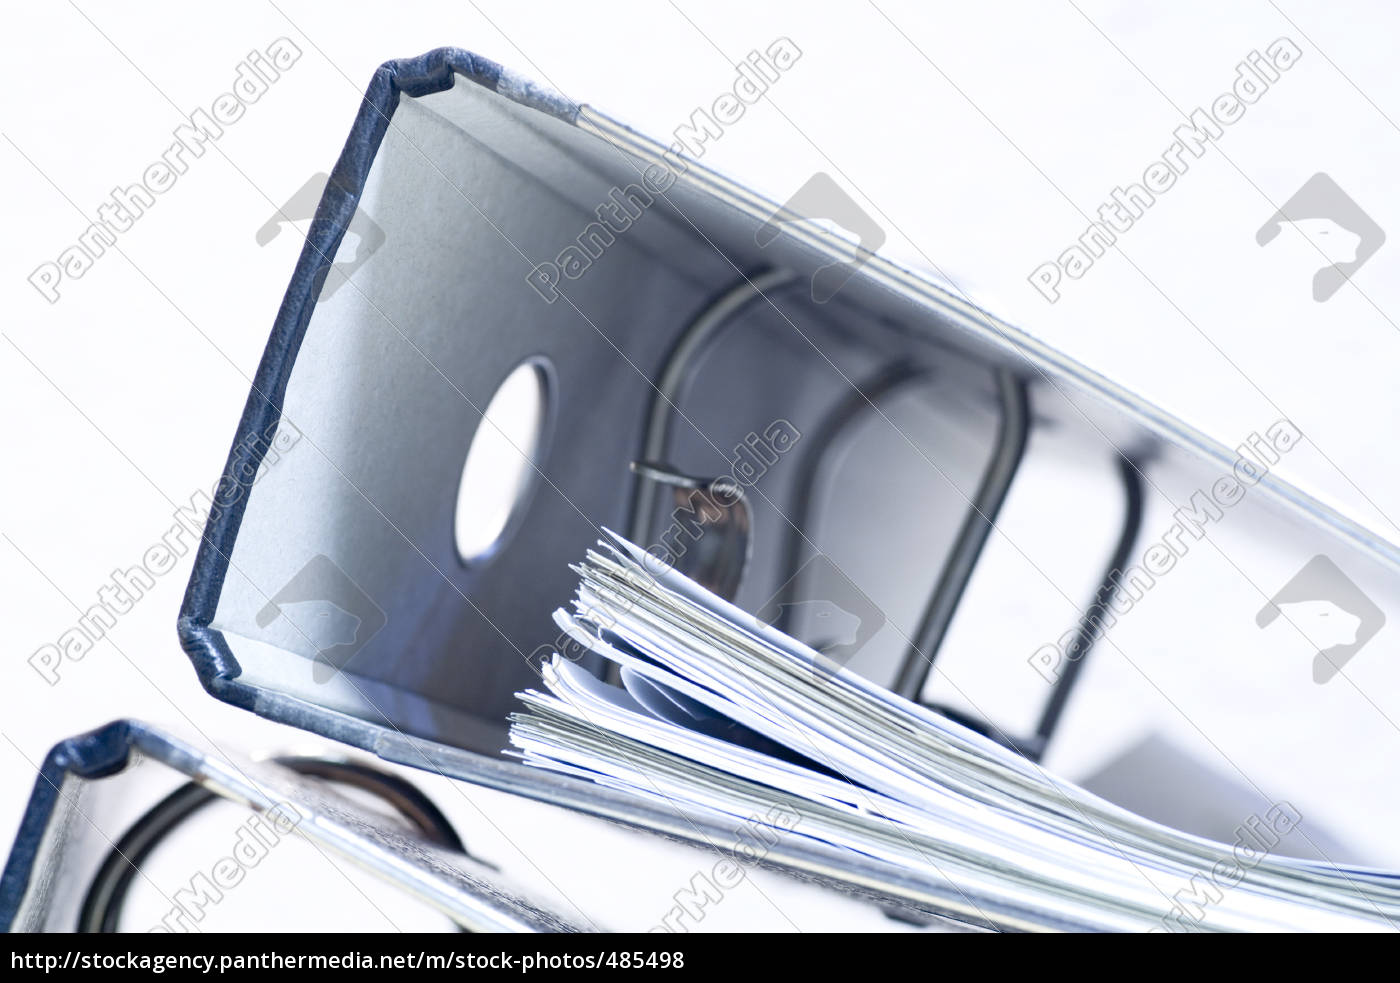 file, folder - 485498